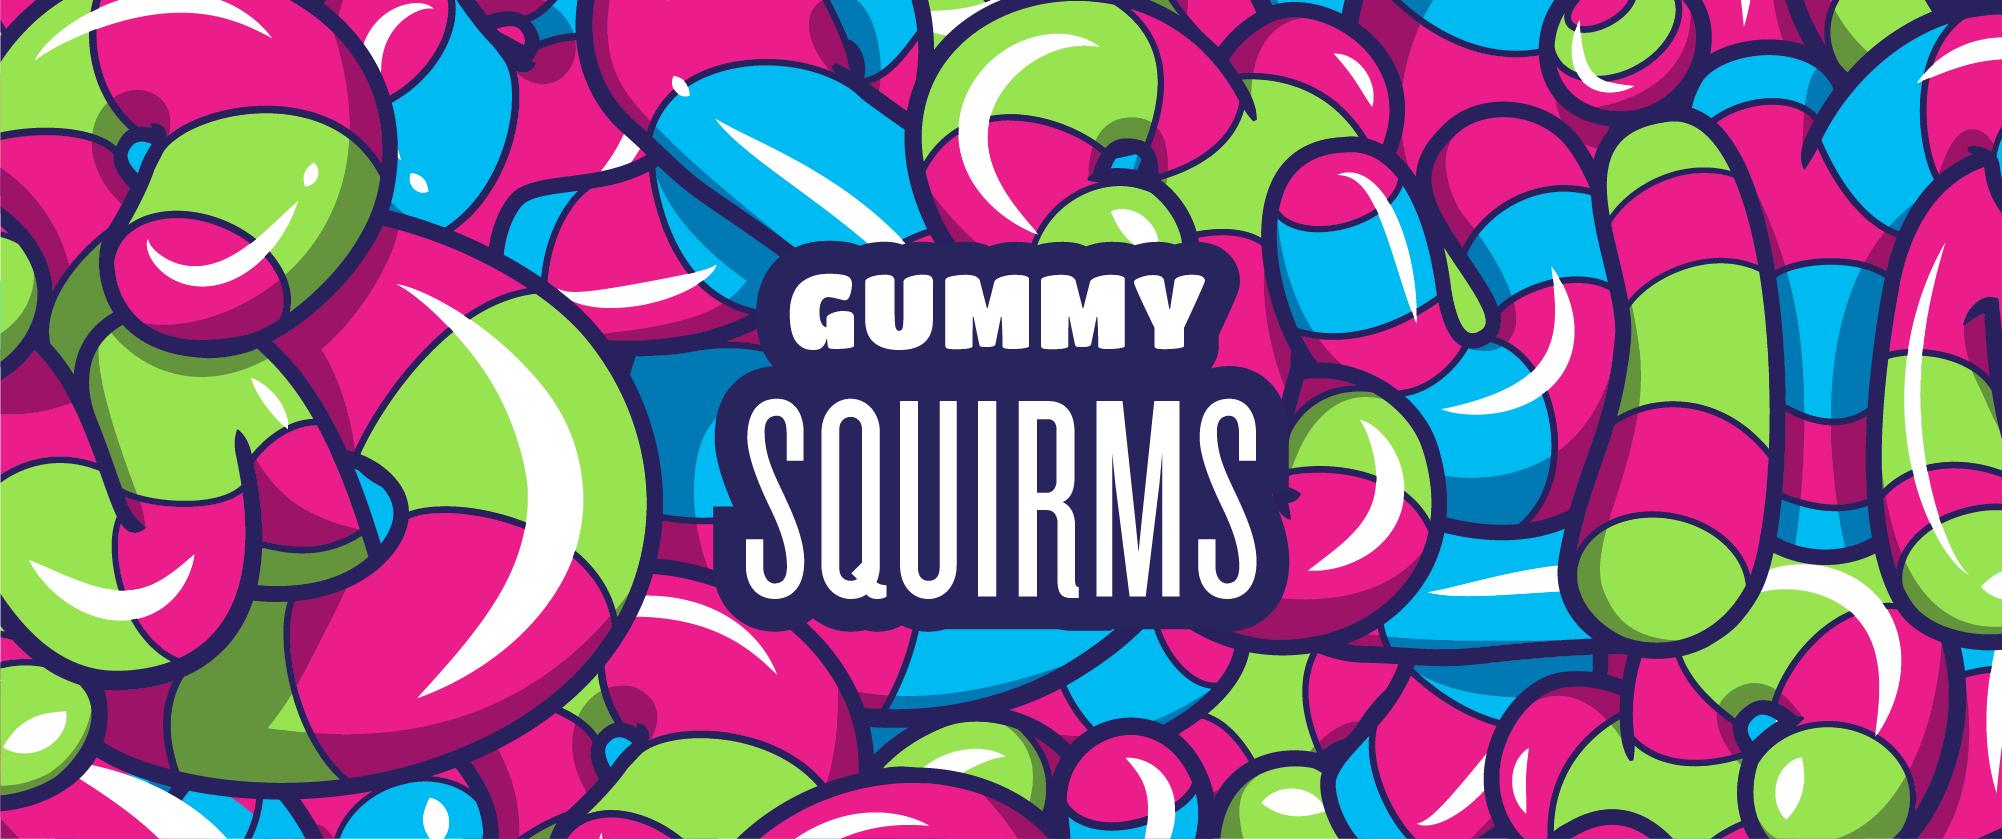 Gummy Squirms_Logo-02